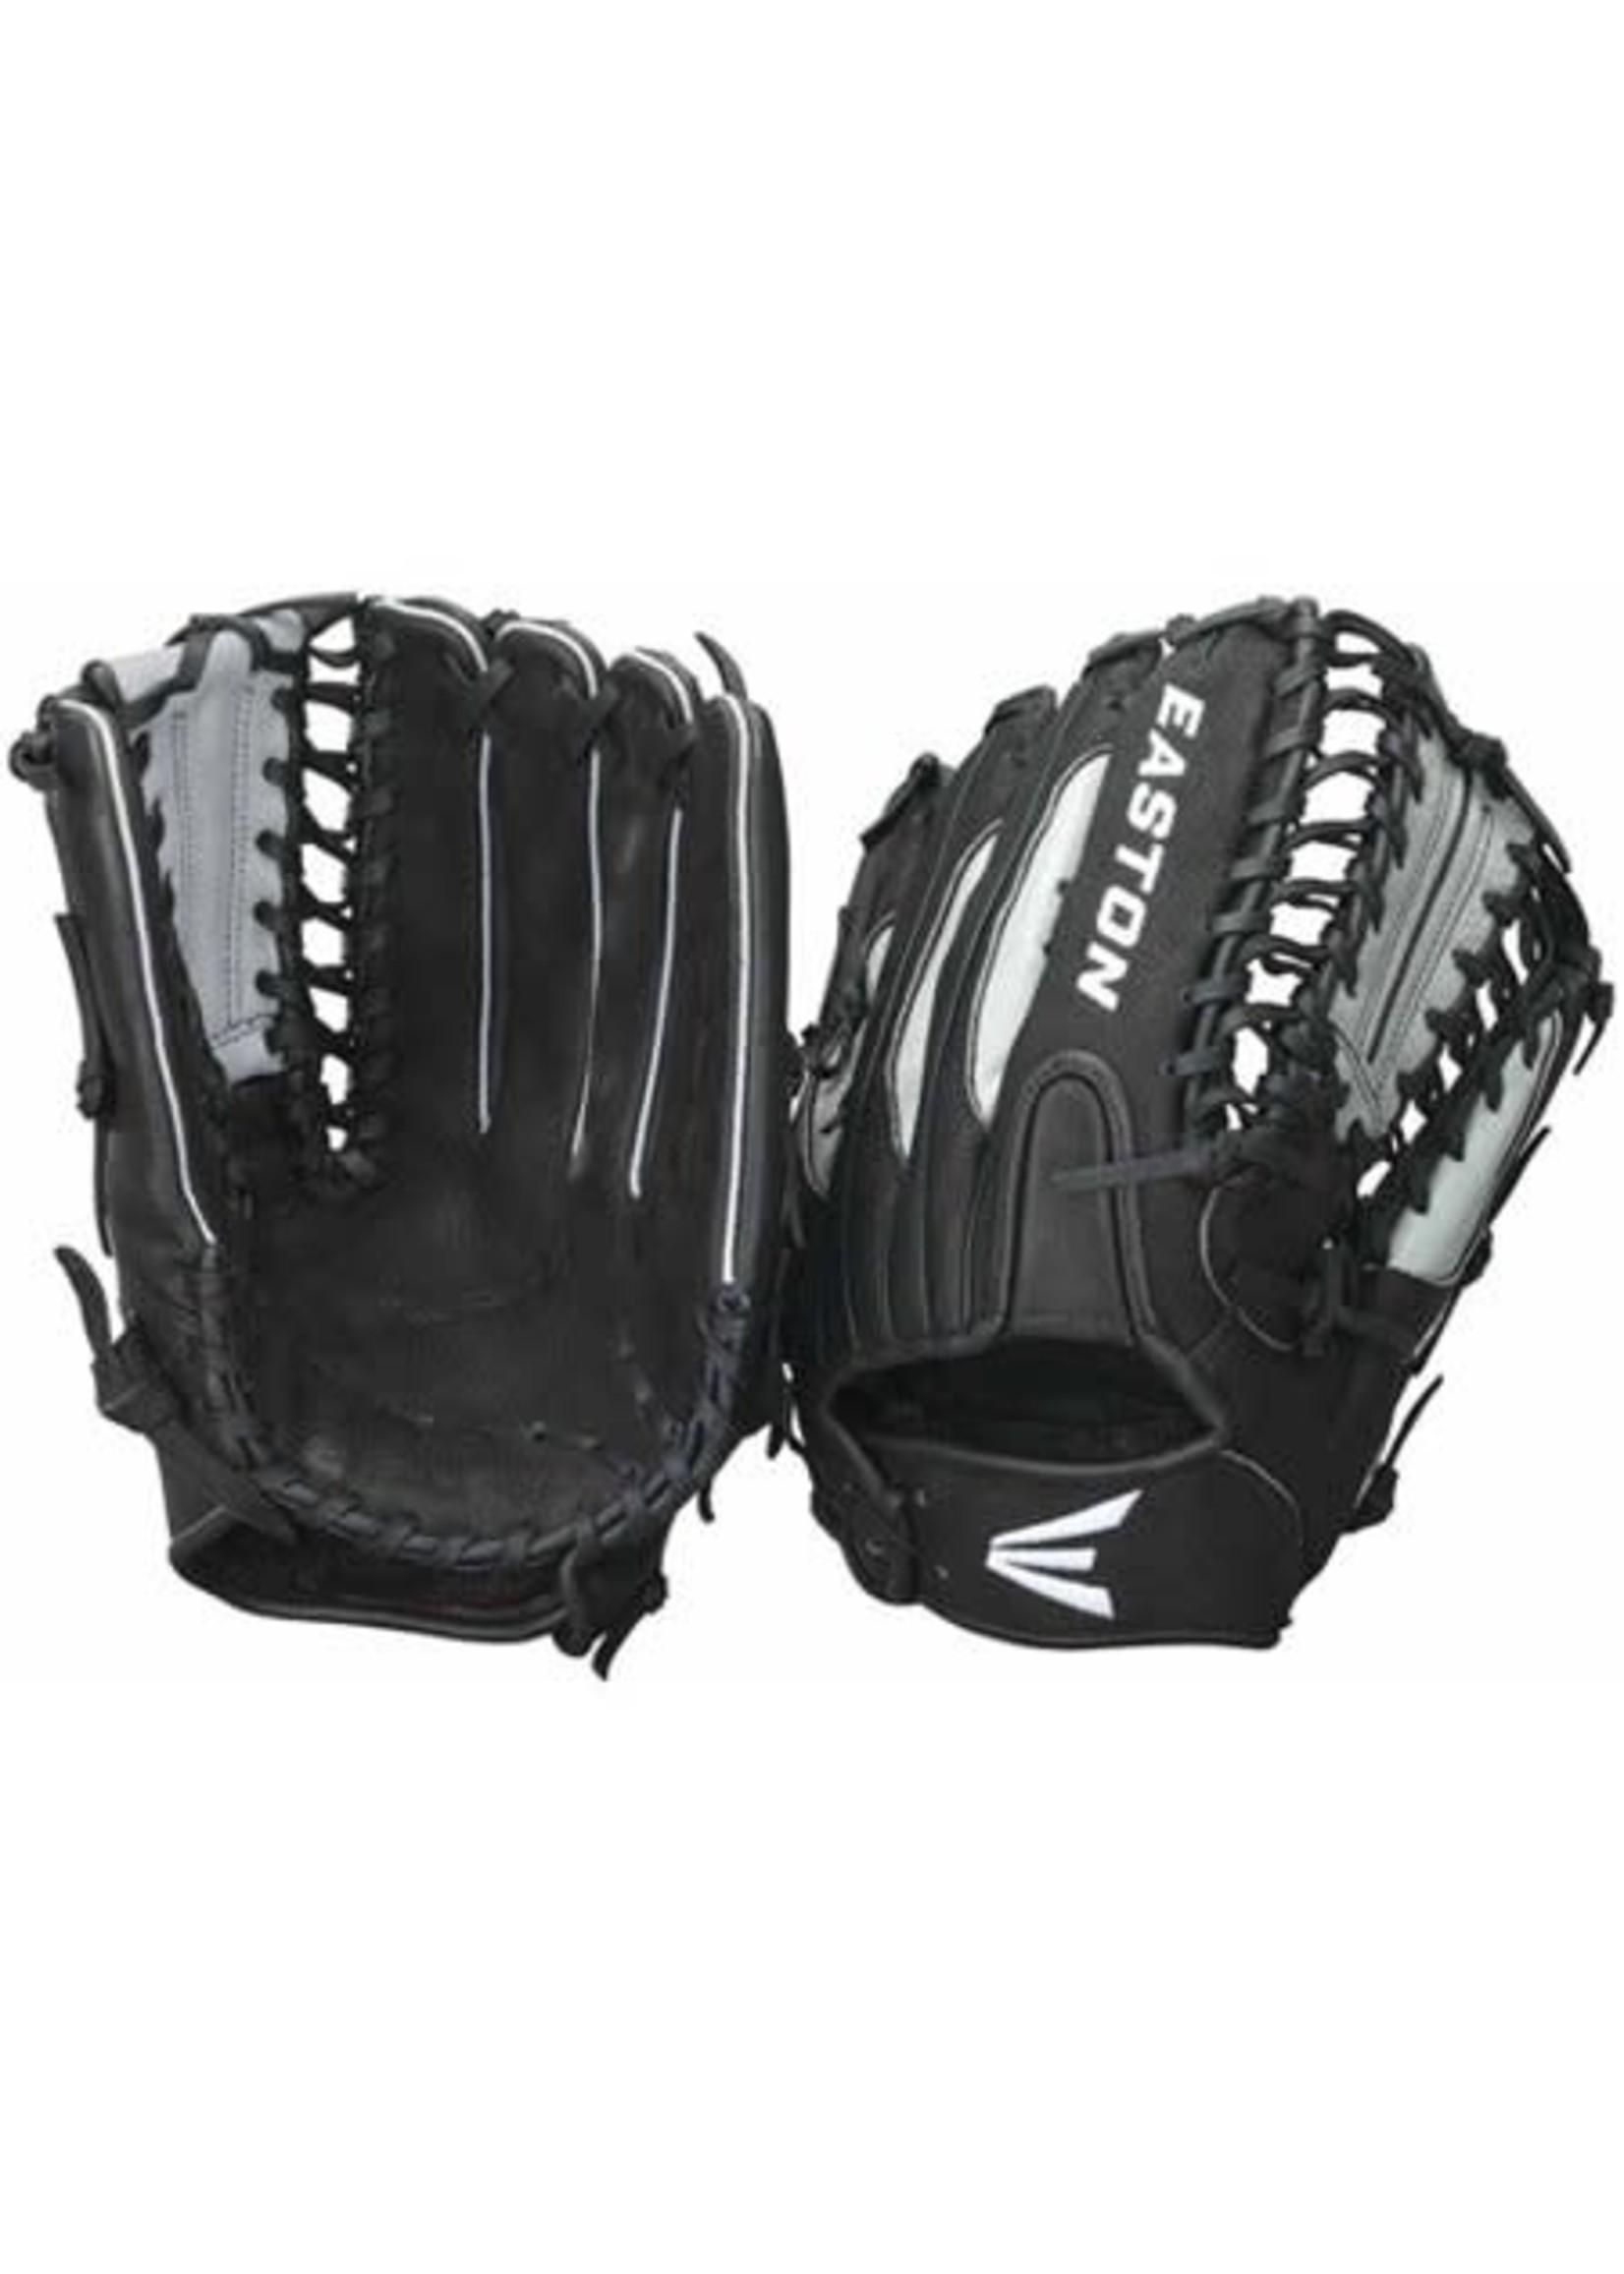 Easton Baseball (Canada) EASTON ALPHA APB1275 BKGY 12.75 IN LHT